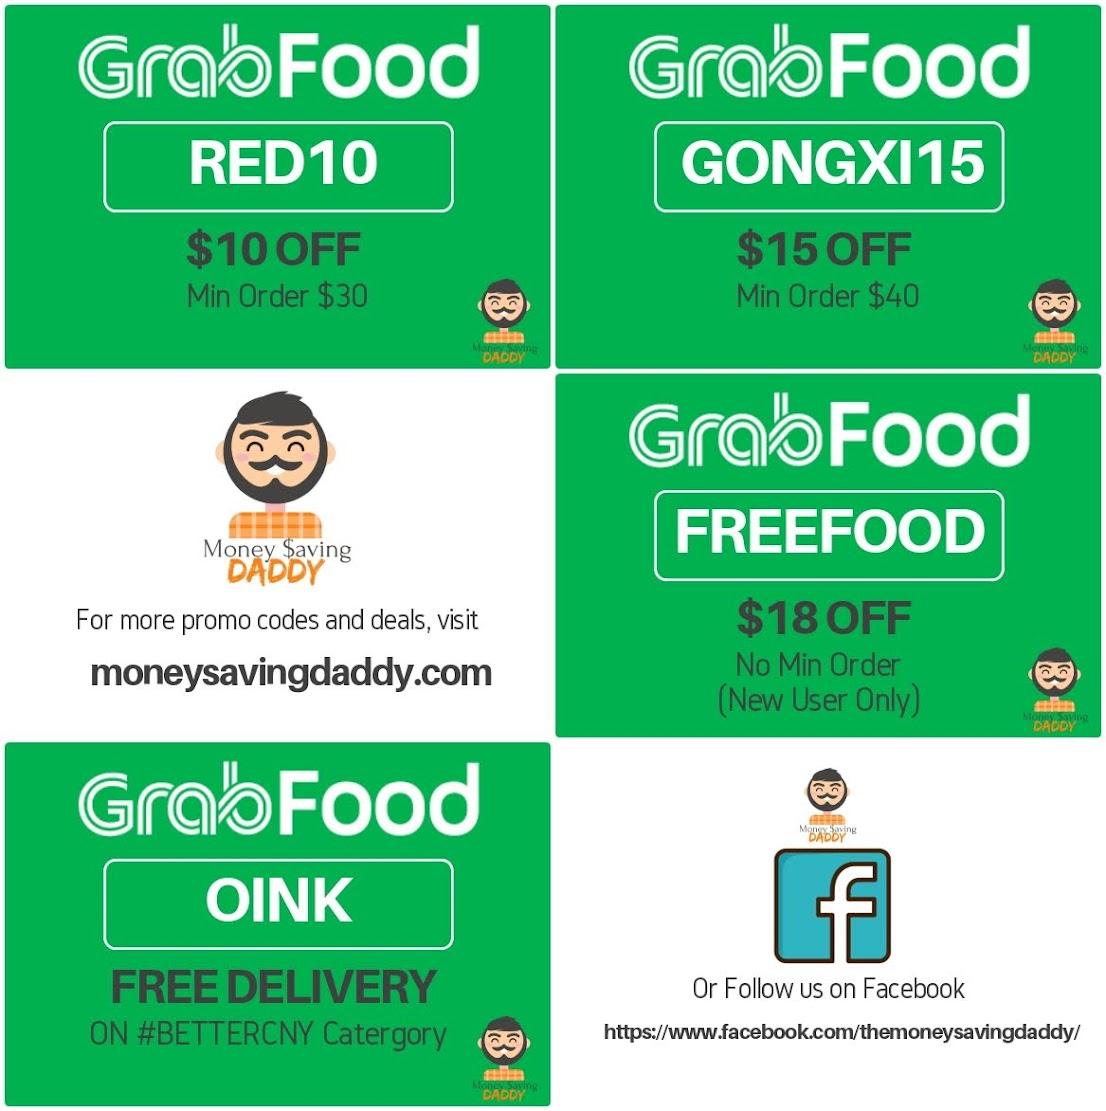 Grab Food Promo Code – 4 Feb to 10 Feb – A Parenting Blog